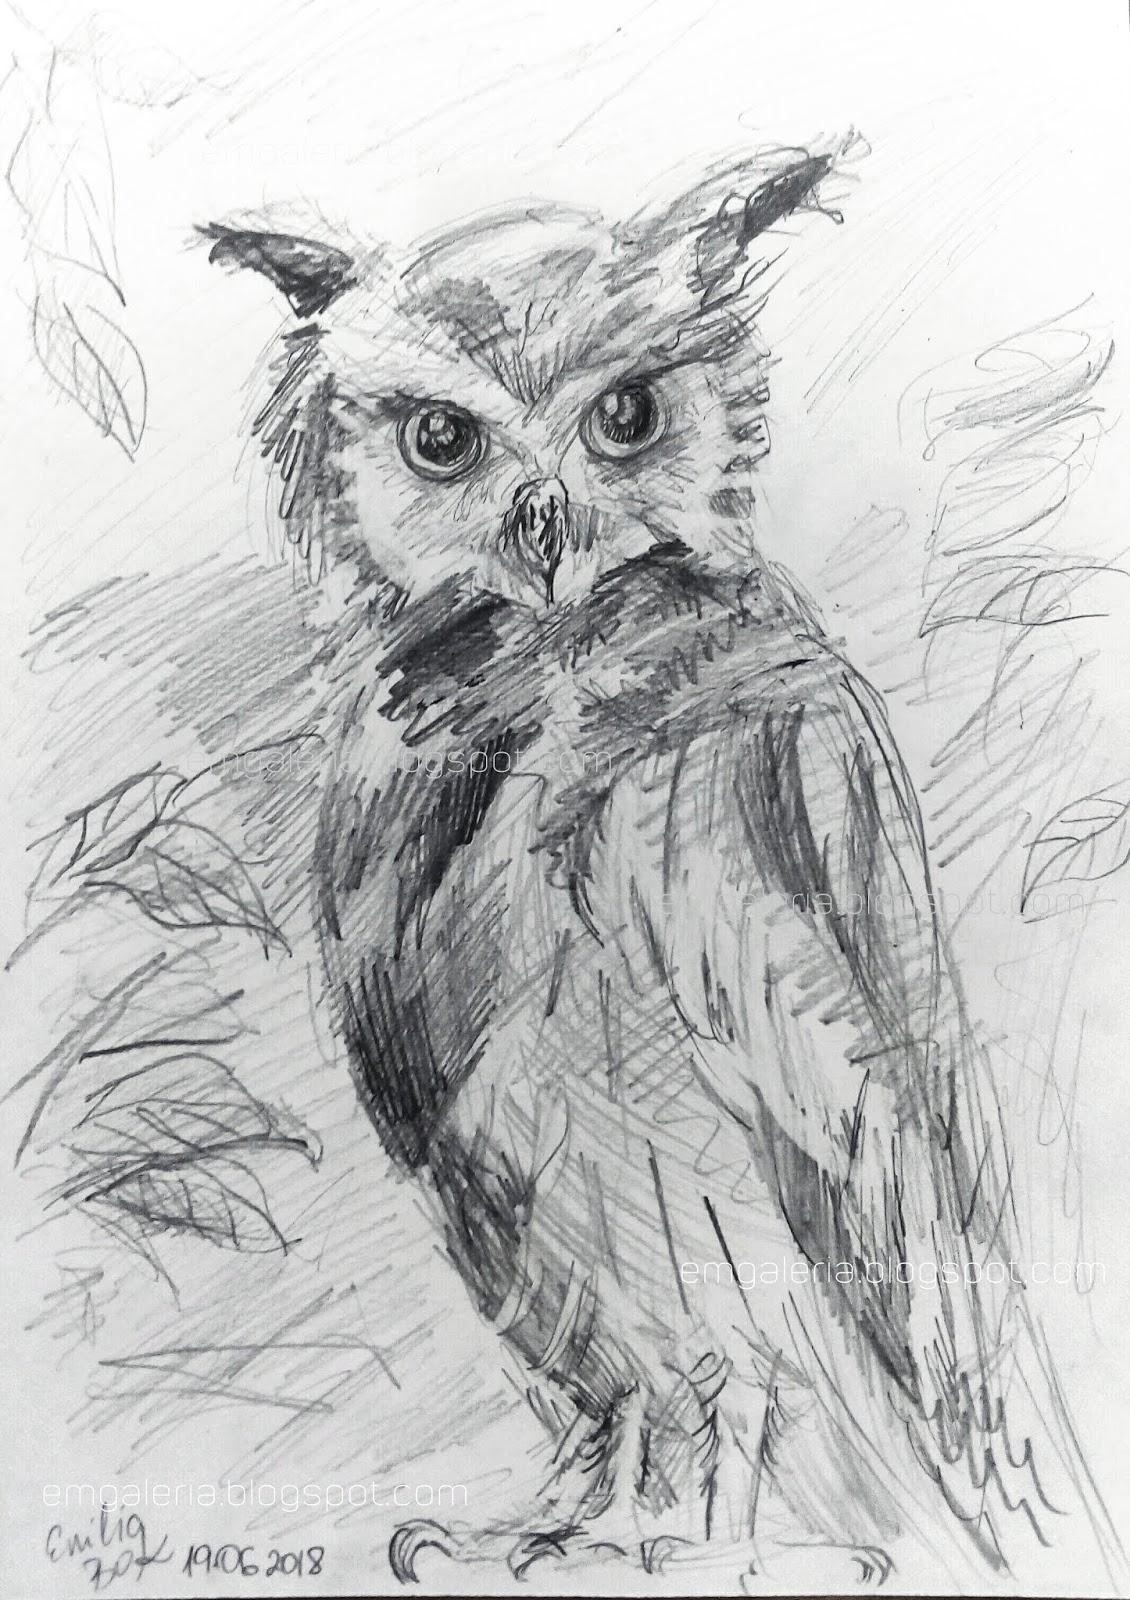 Rysunek Obraz Sowa Rysunek Olowkiem